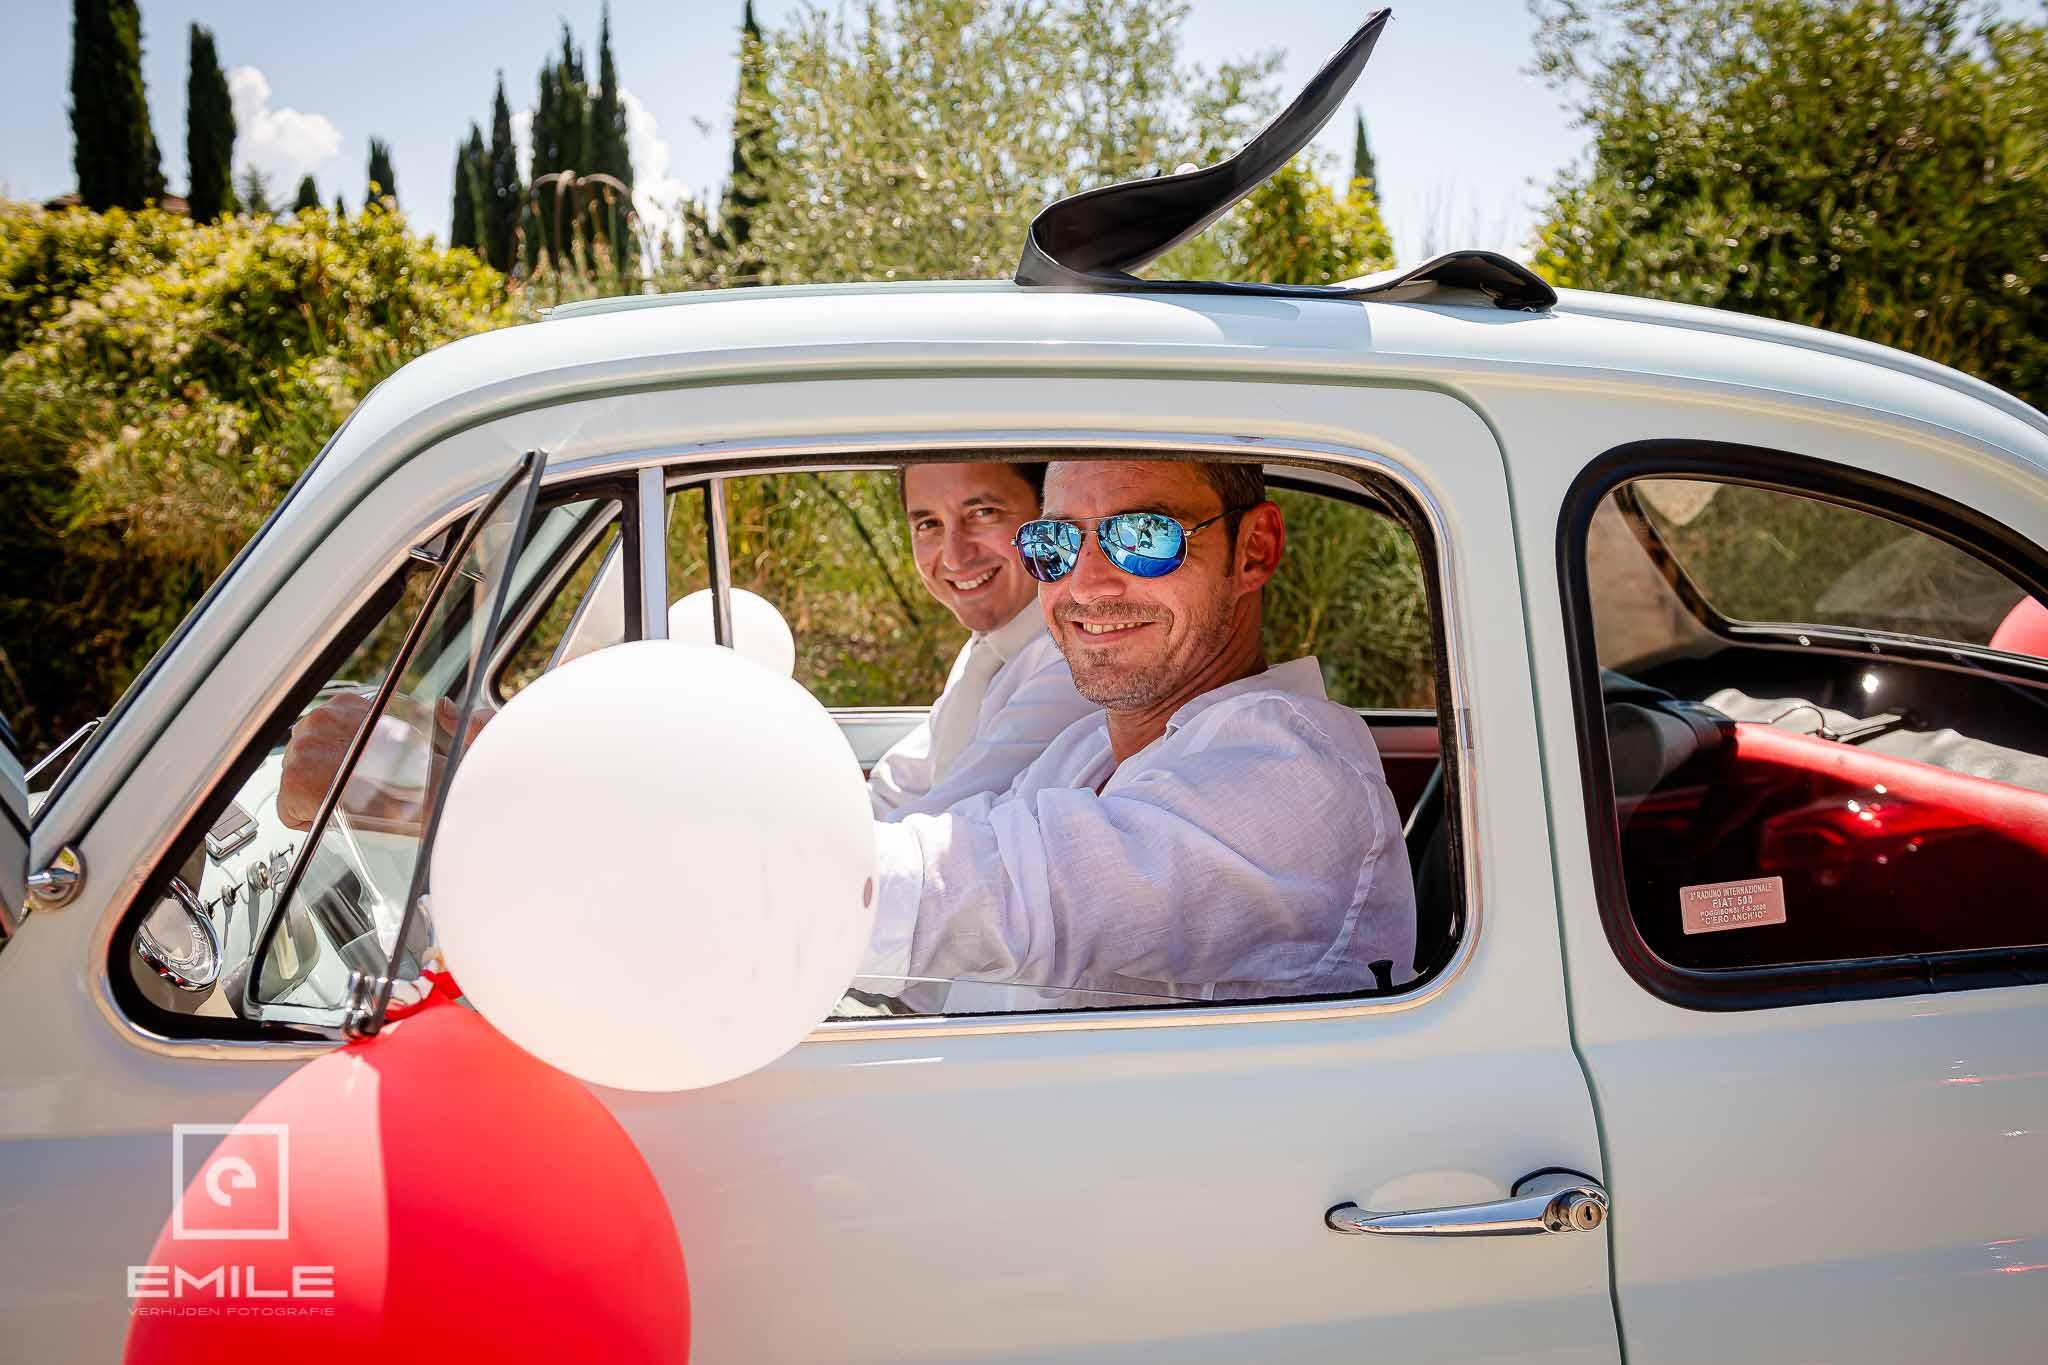 De chauffeur zit ook al in de FIAT 500 - Destination wedding San Gimignano - Toscane Italie - Iris en Job